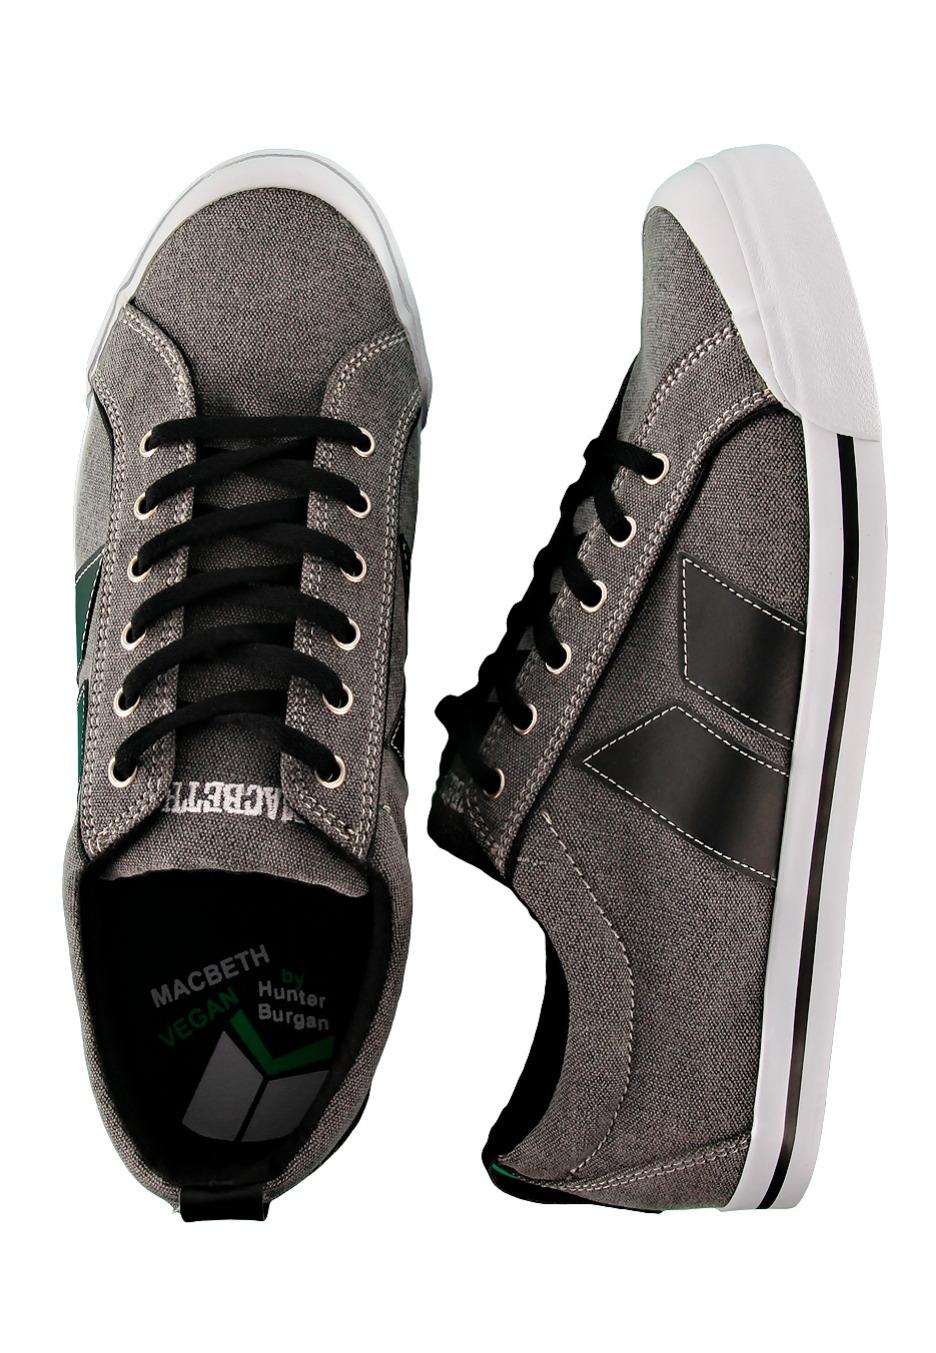 Macbeth   Eliot Premium Hunter Burgan Grey Black   Shoes   Impericon com  Worldwide. Macbeth   Eliot Premium Hunter Burgan Grey Black   Shoes